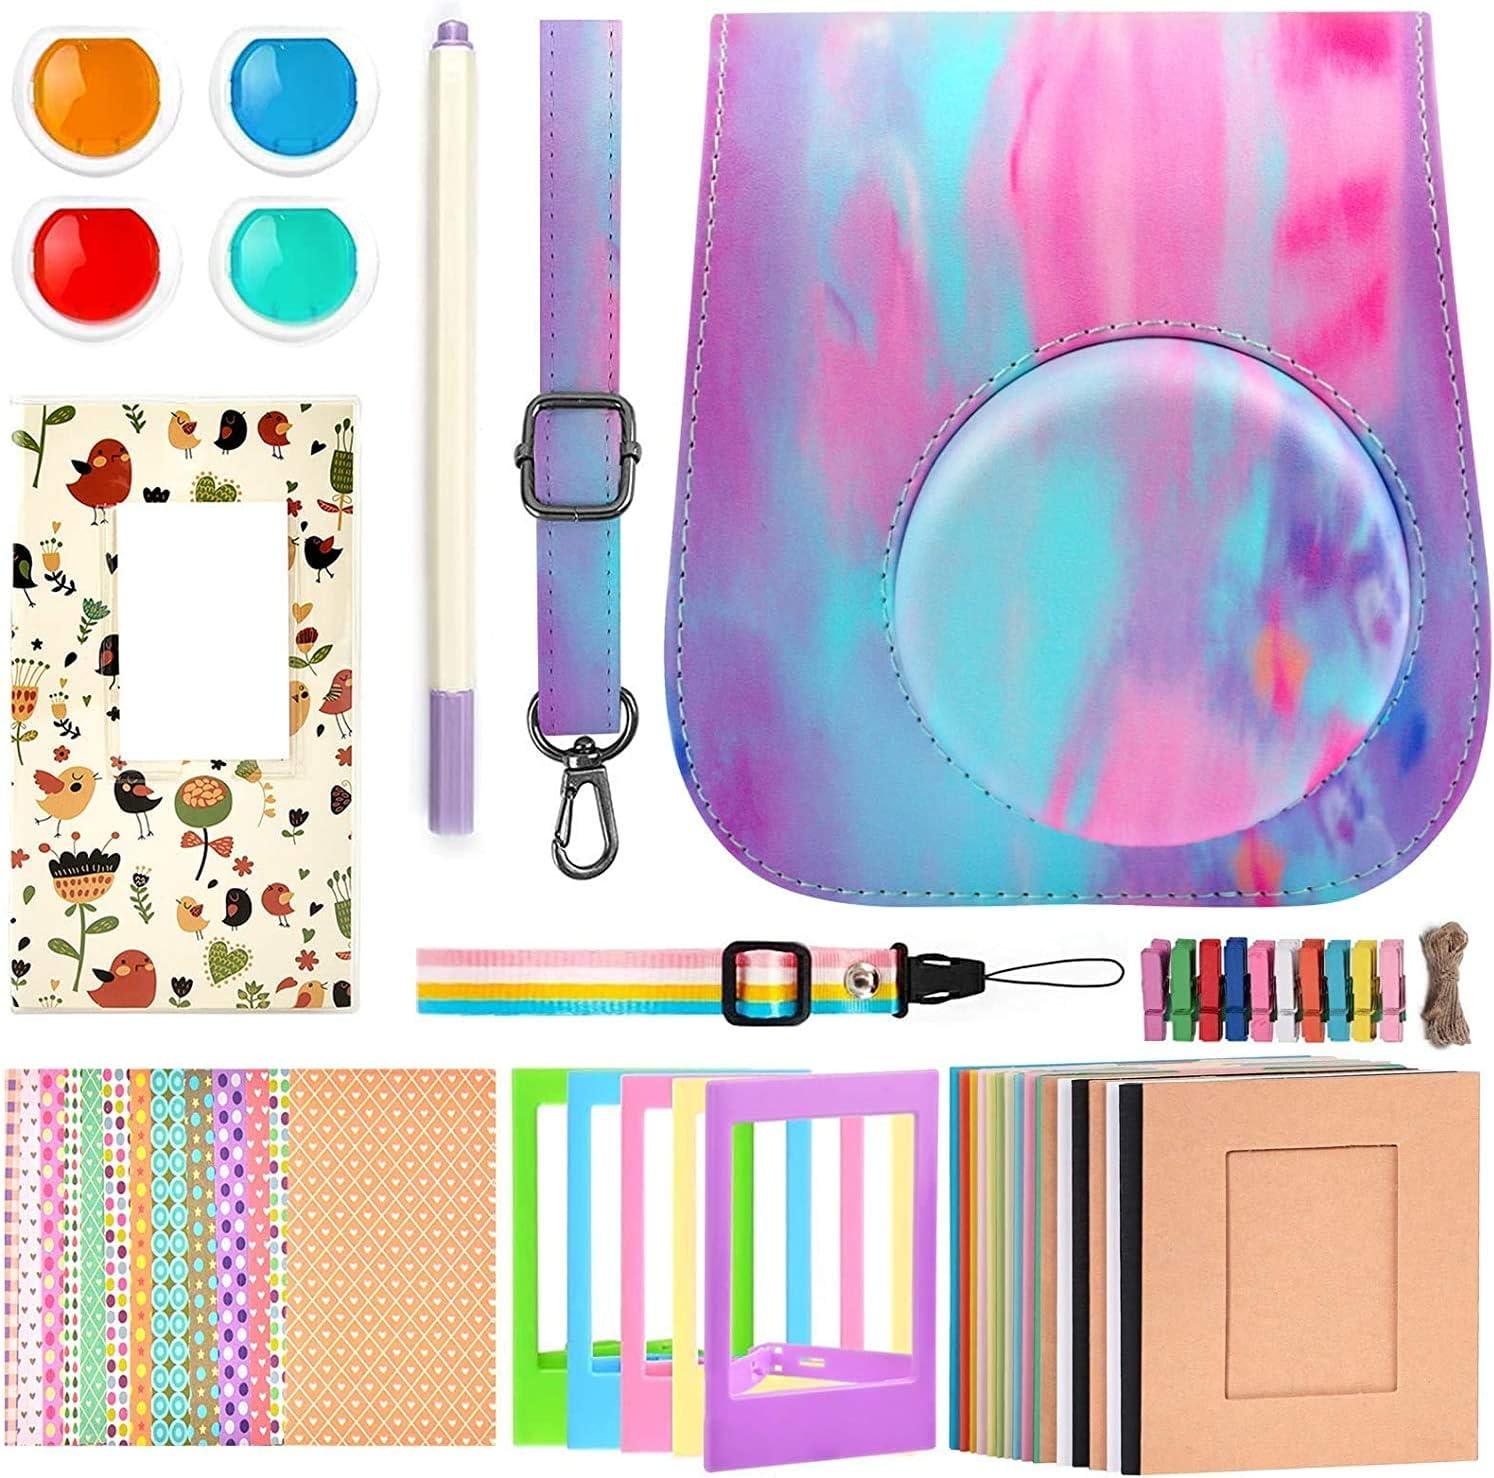 Cámara instantánea compatible con Instax Mini 11 cámaras instantáneas son carcasa, correa, filtros, álbum, marco de película, adhesivo de marco, lápiz de metal.